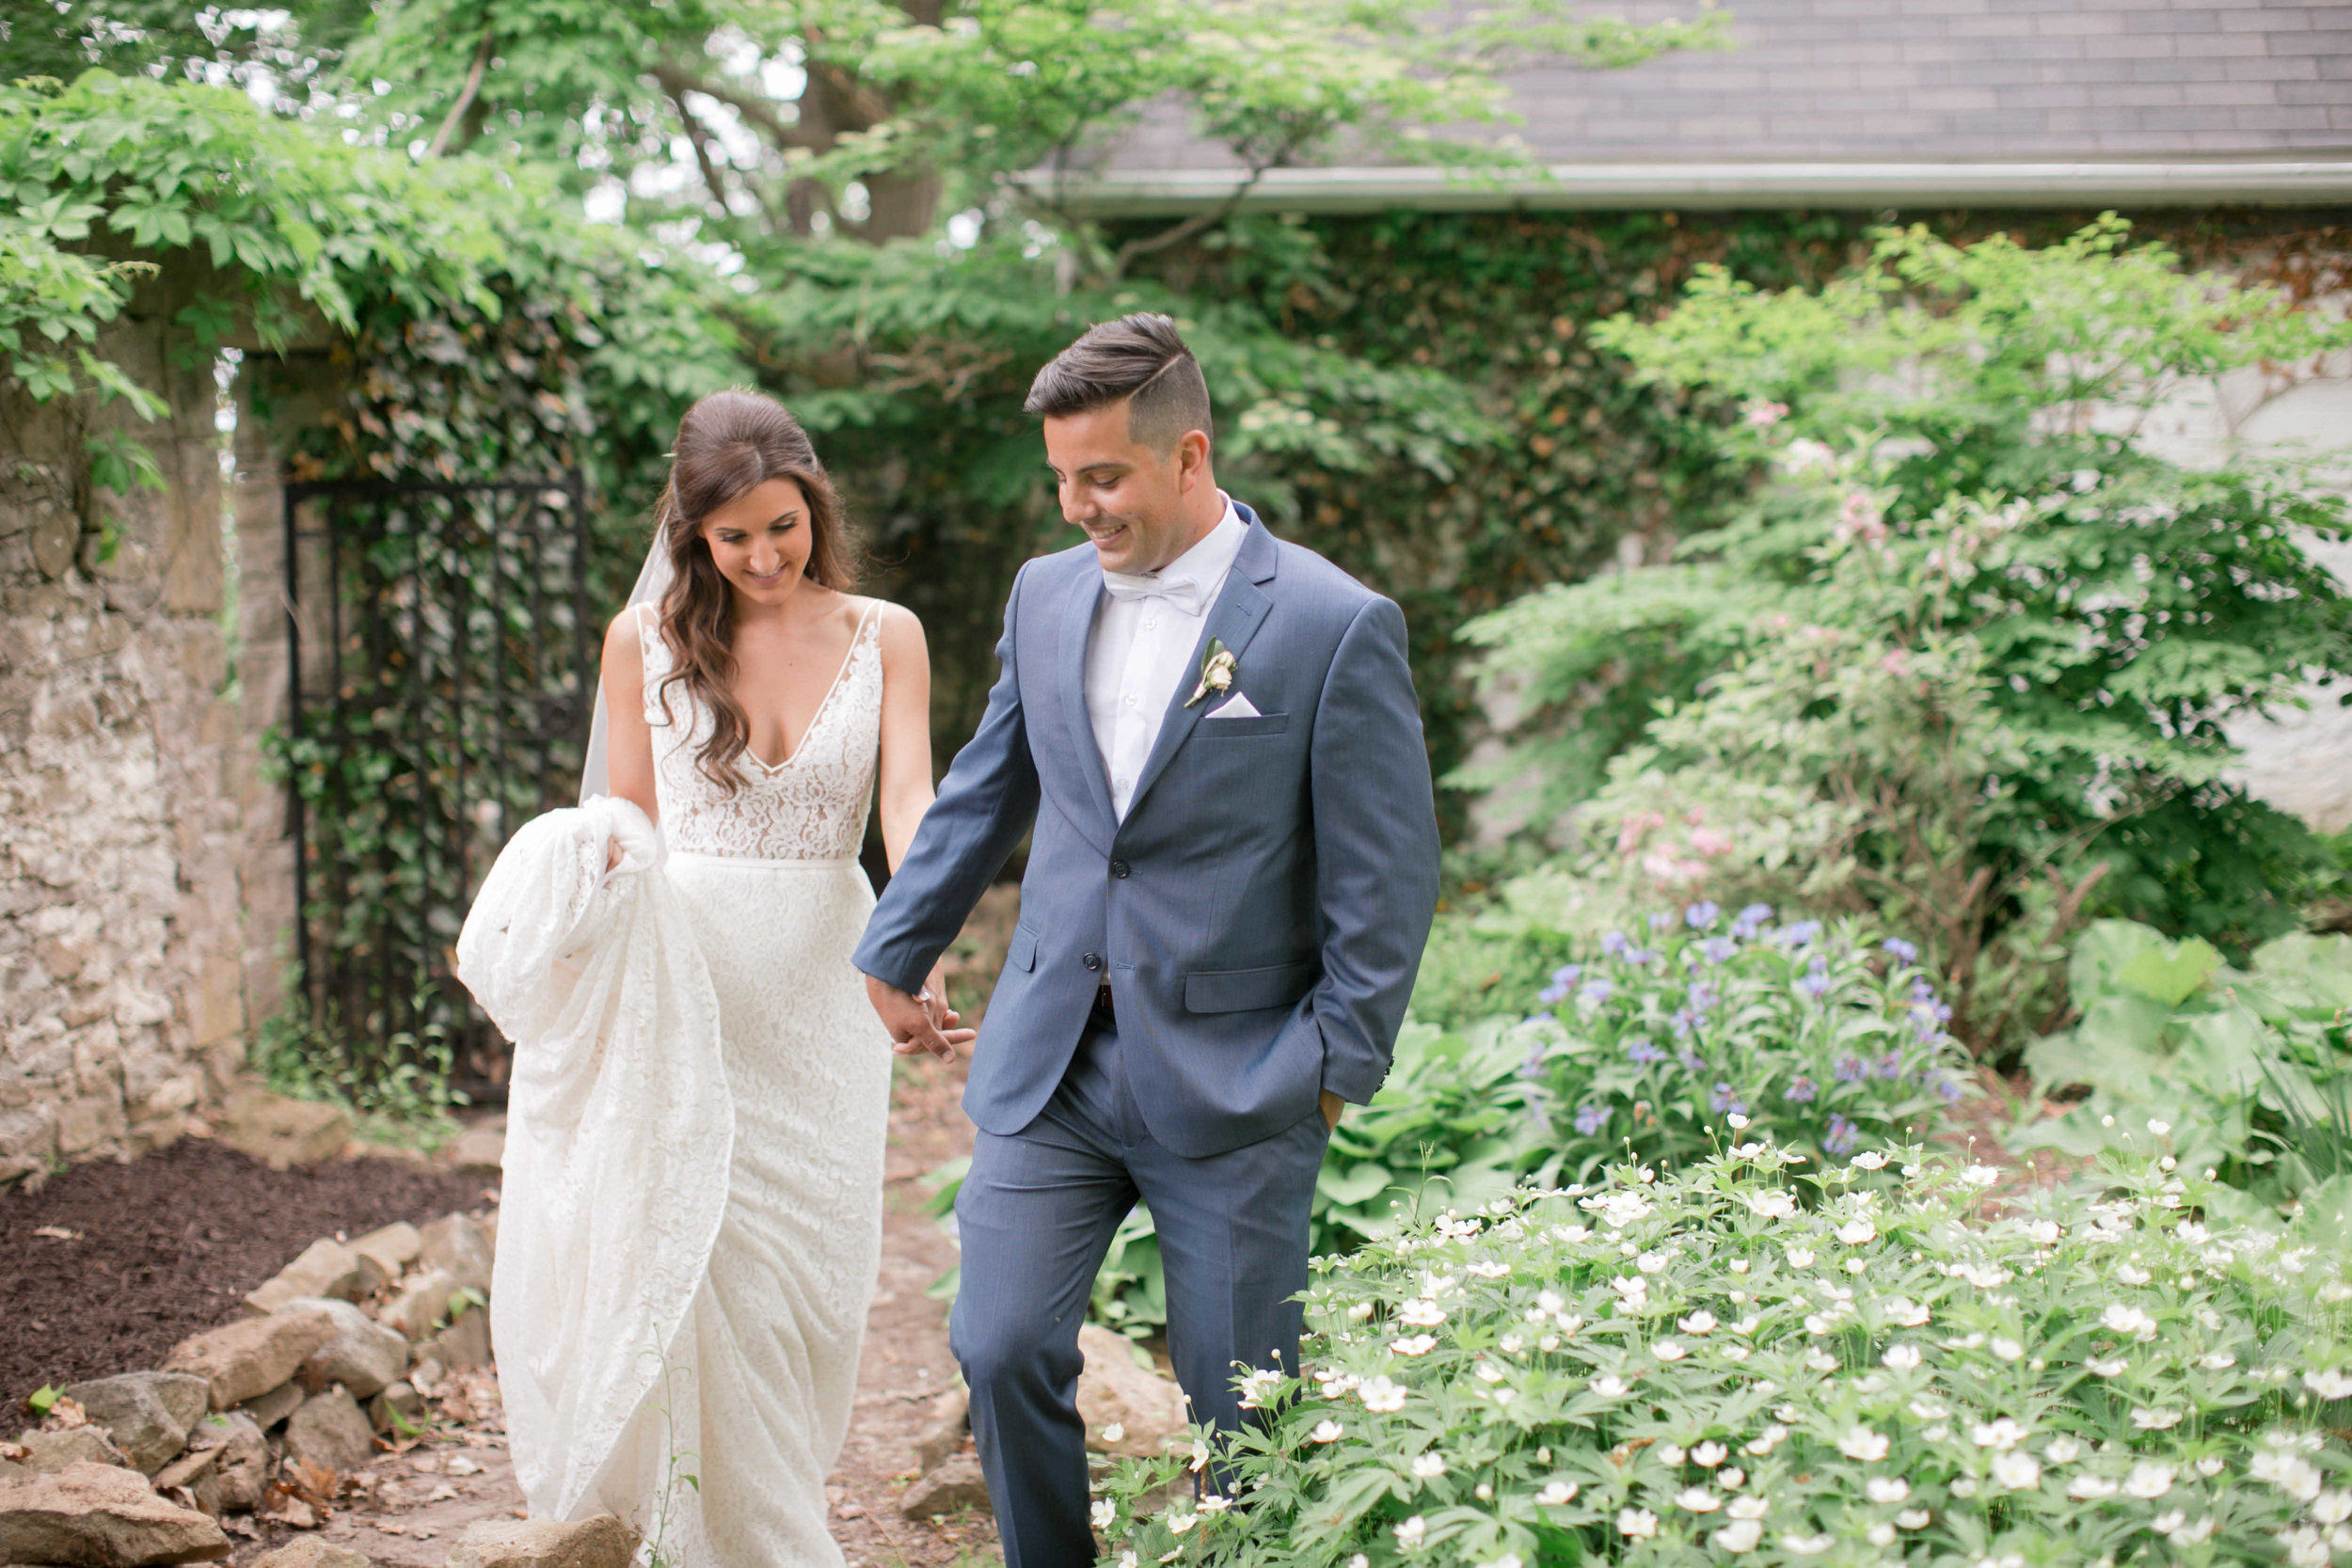 Miranda___Daniel___Daniel_Ricci_Weddings___High_Res._Finals_441.jpg